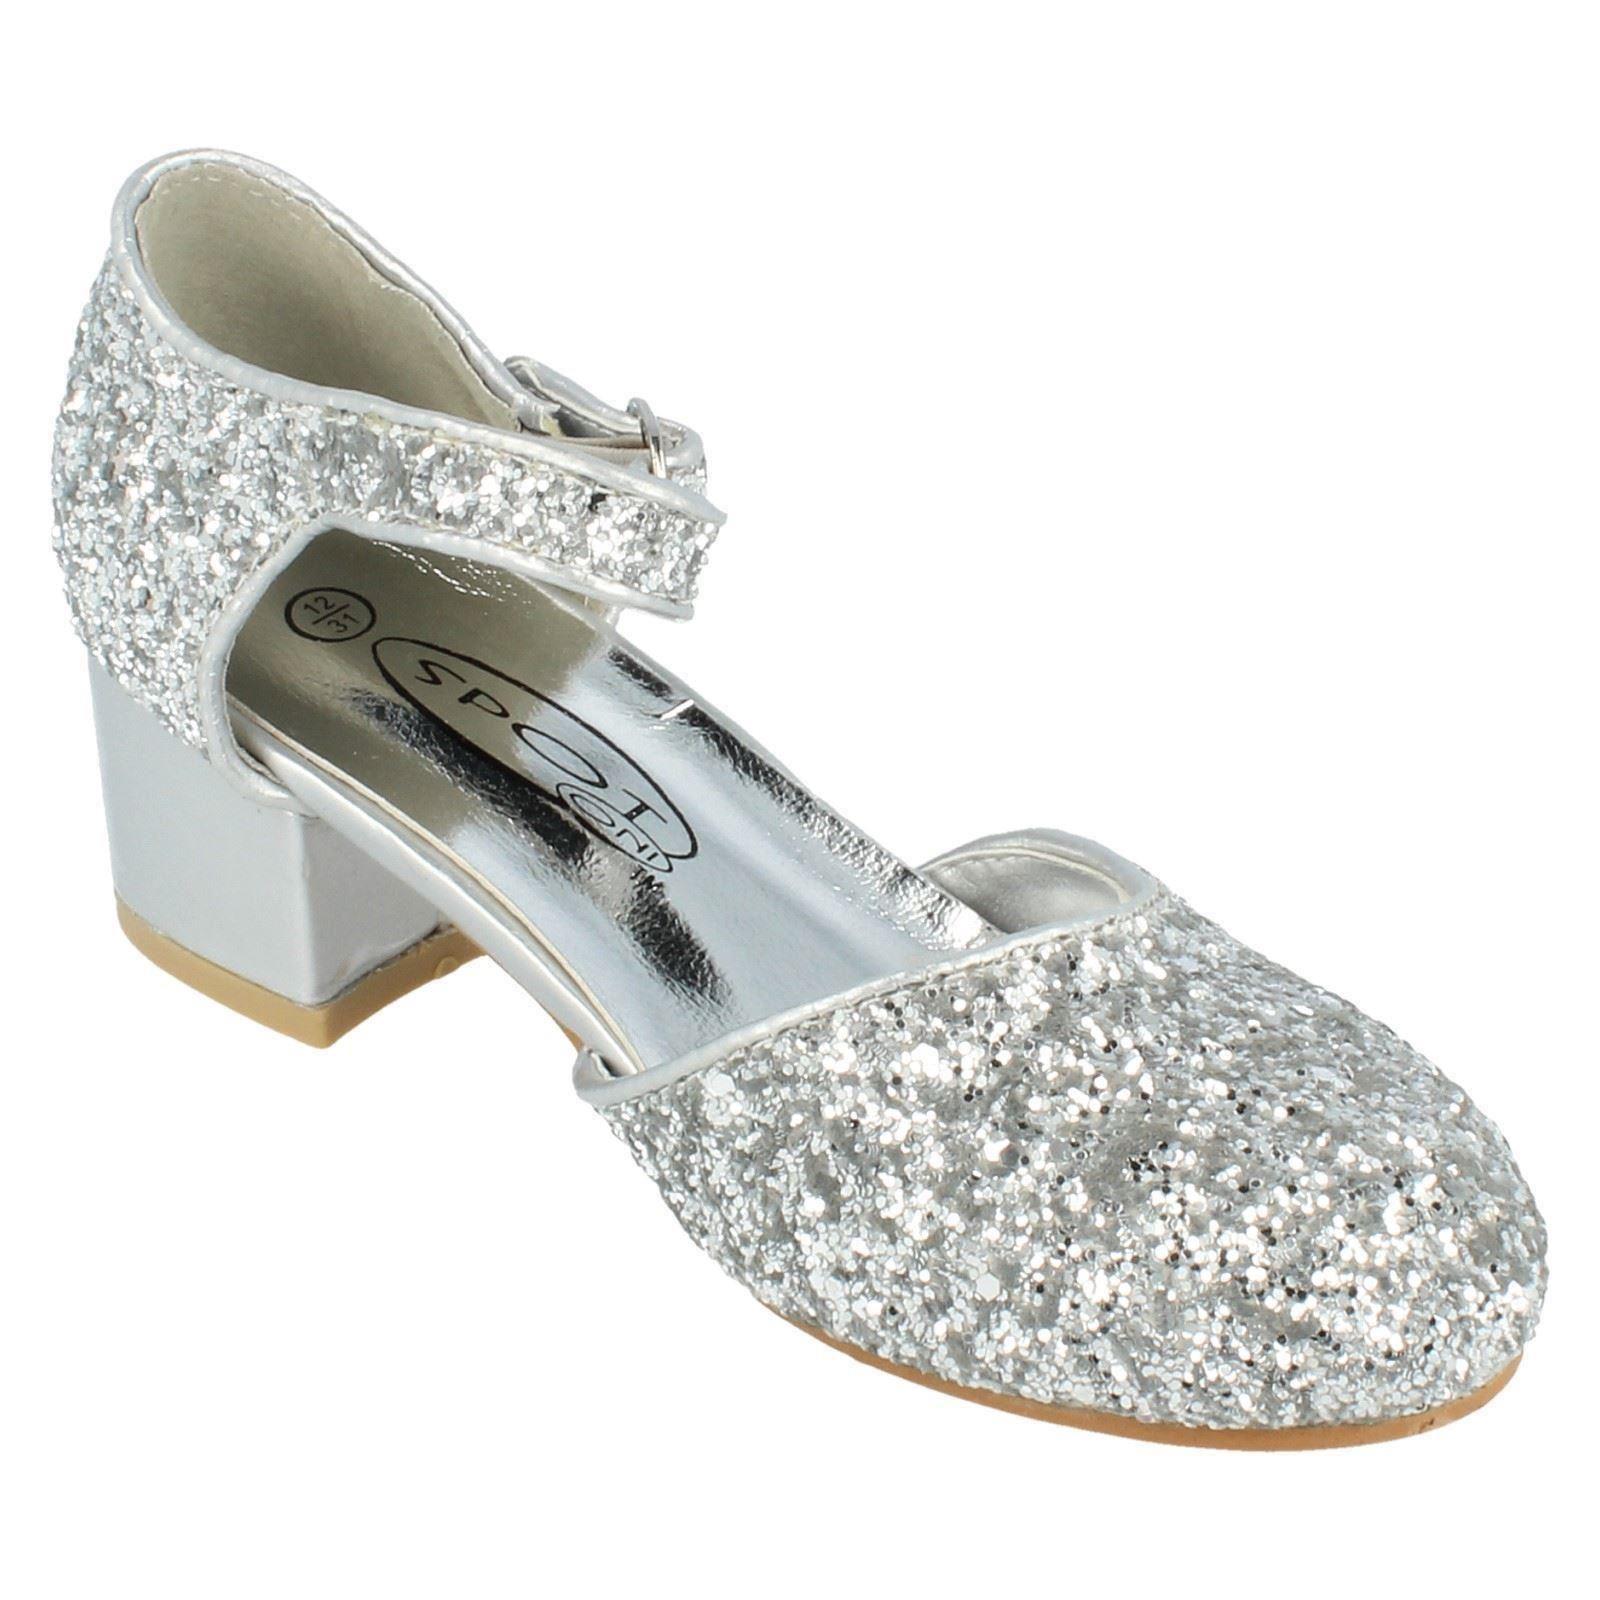 Girls Spot On Glitter Court Shoe The Style H3065 ~ N